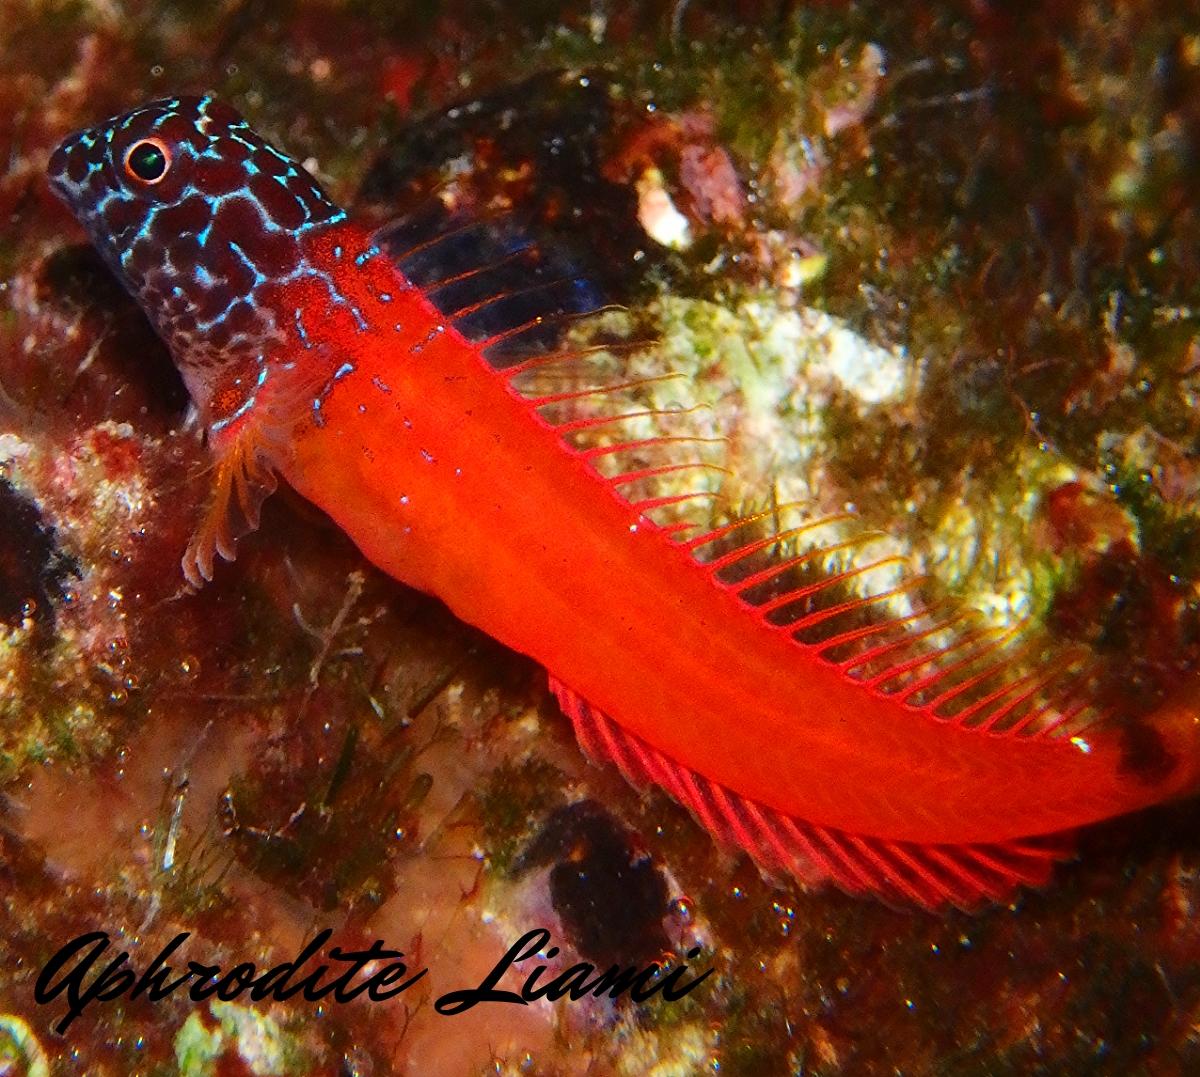 #wreck #boat #ship #sea #marine #sealife #marinelife #crab #seastar #starfish #star #crab #tubeworm #worm #nudibranch #fish #life #eco #animal #diver #diving #scubadiving #scuba #dive #photo #photography #greece #kos